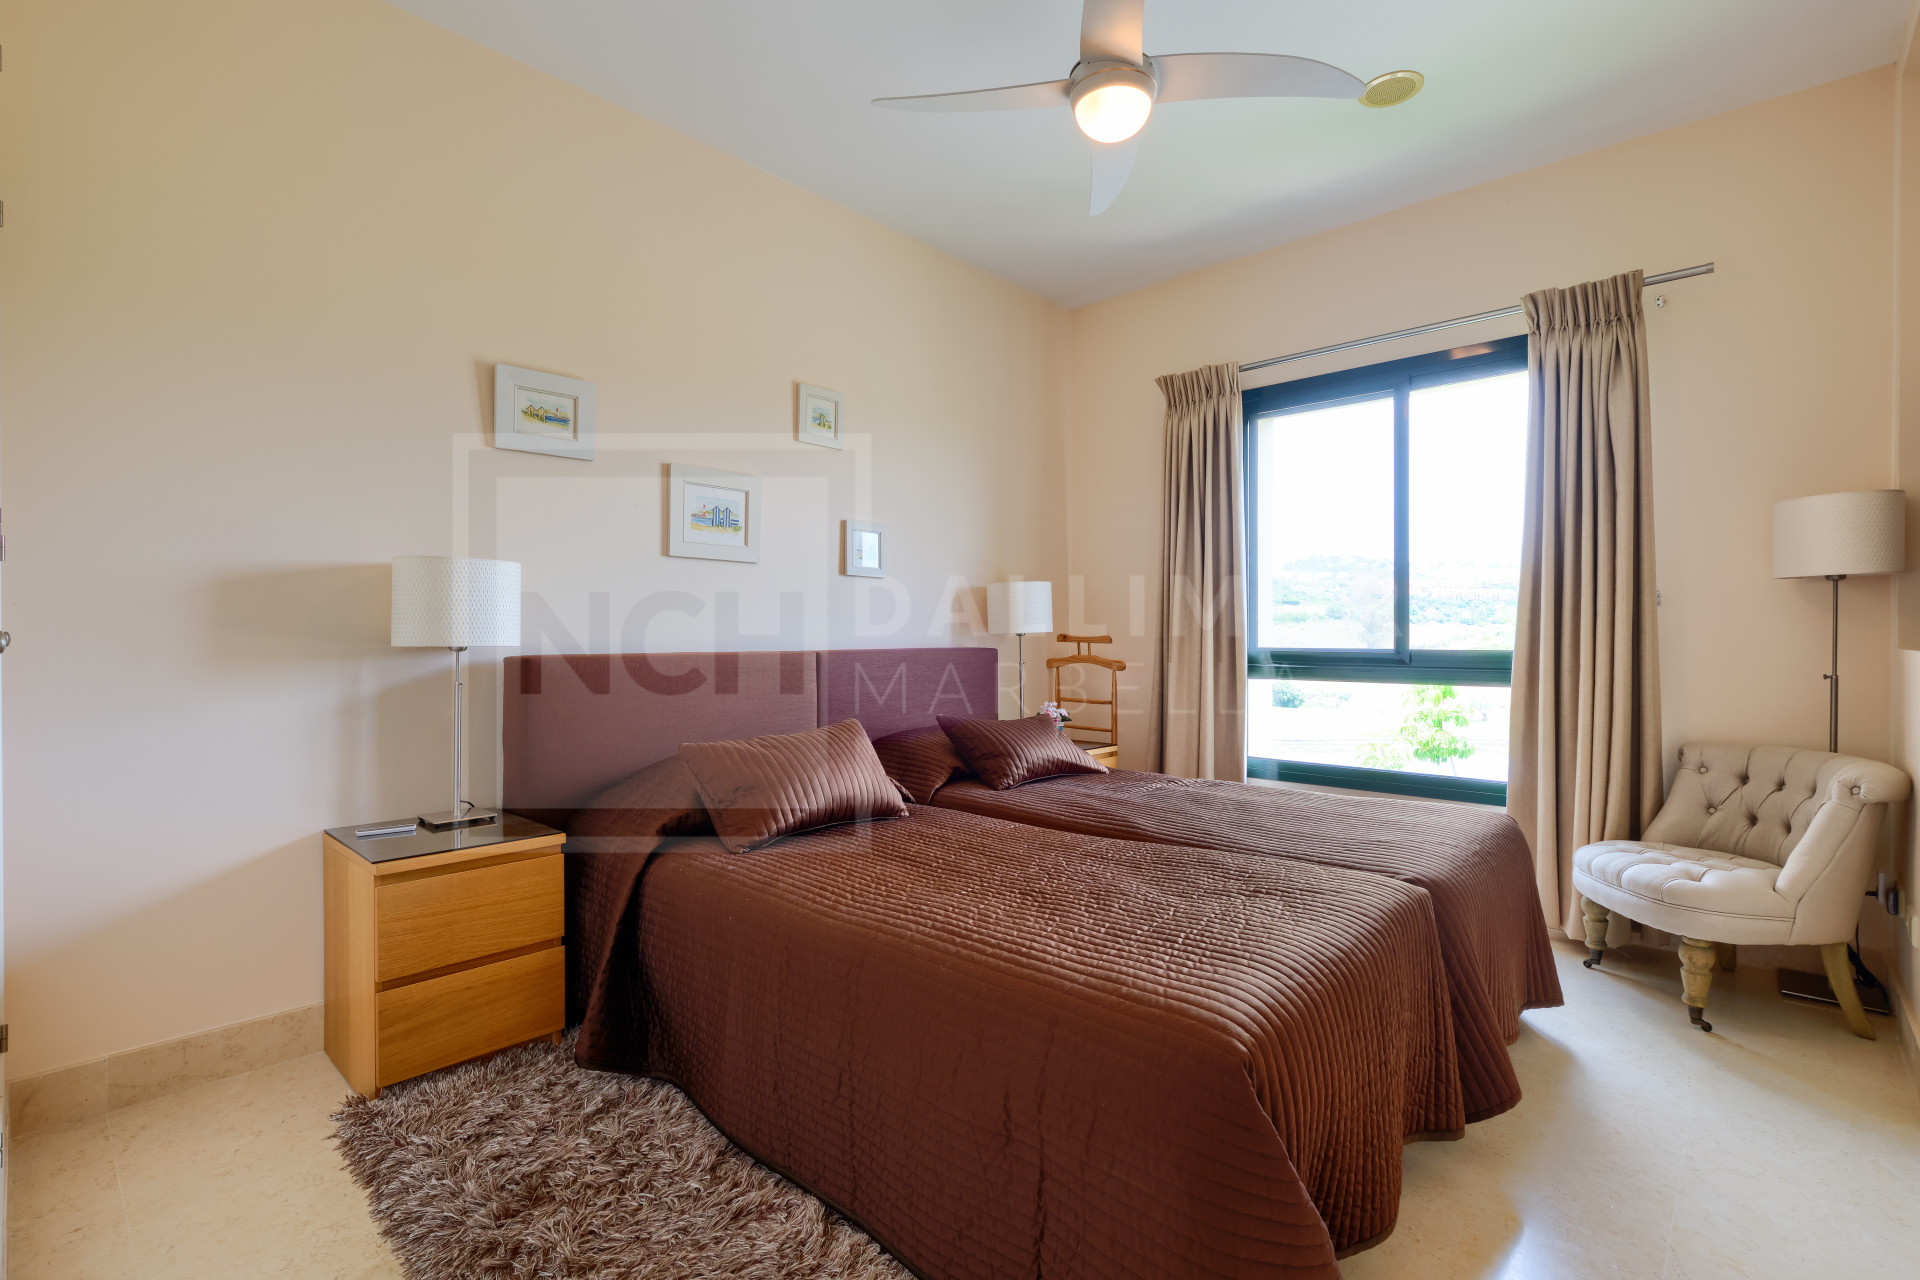 Duplex Penthouse Los Capanes del Golf, Benahavis – NEWPH6699